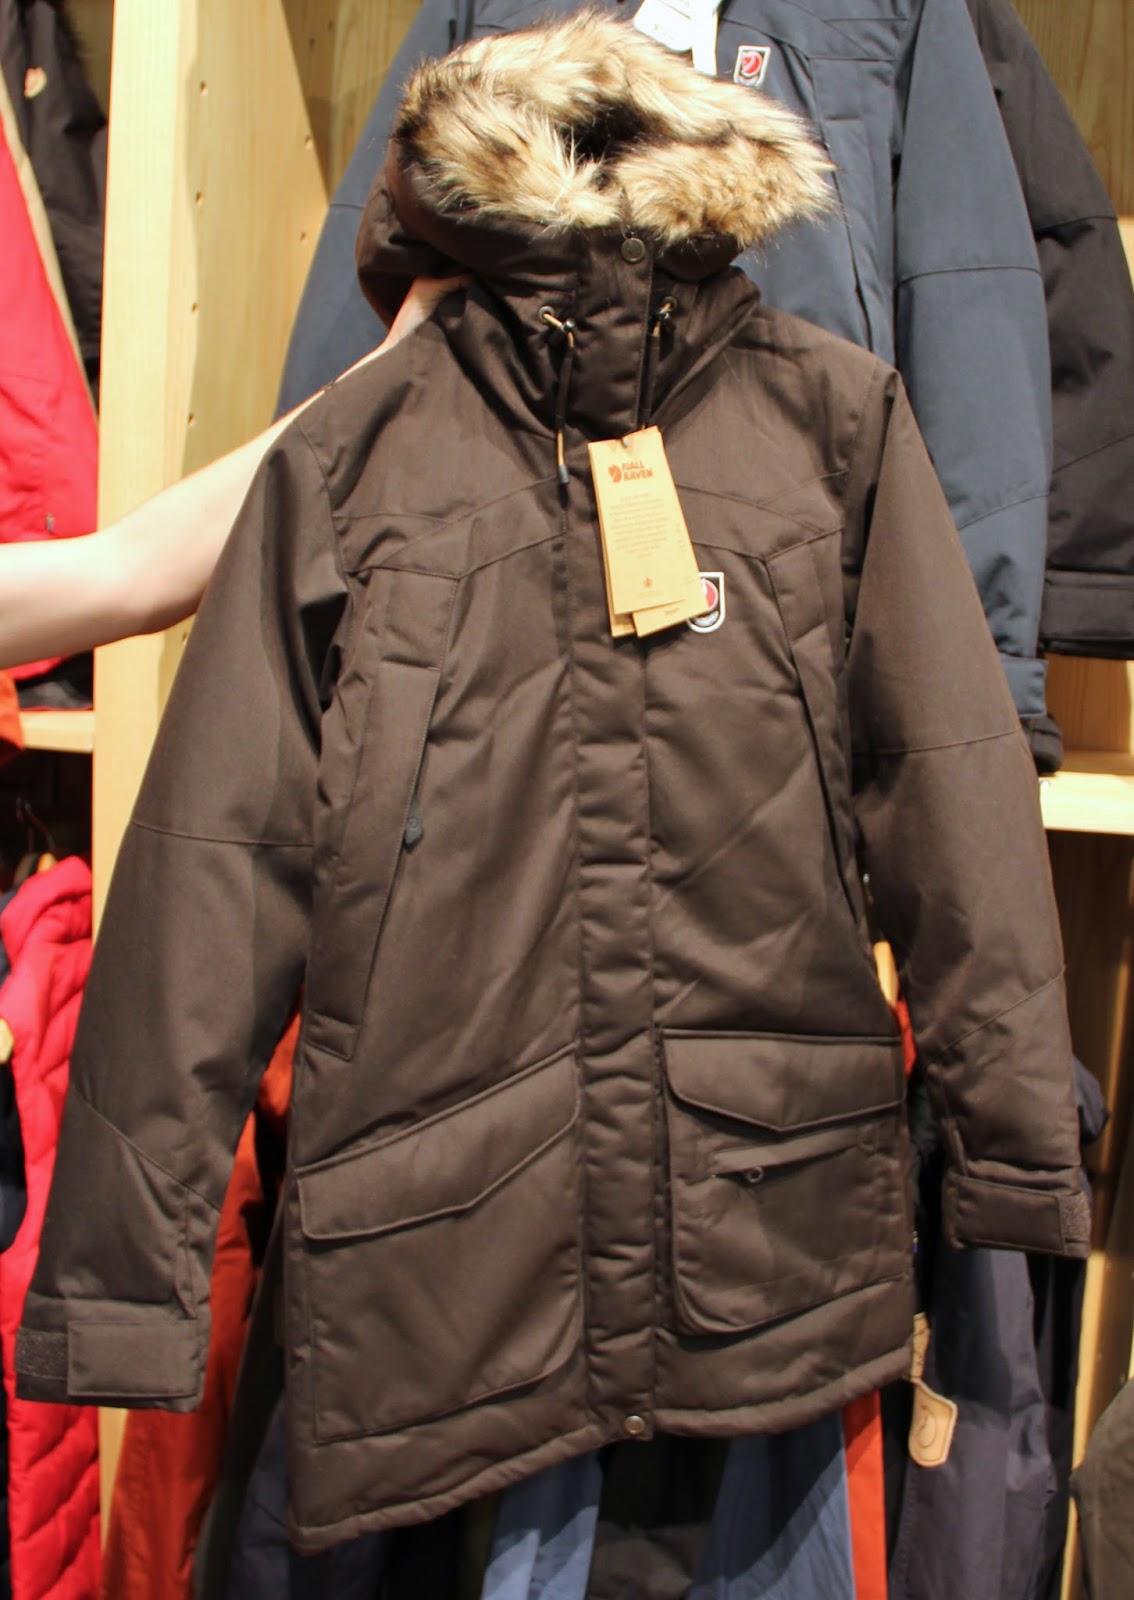 lyra mag fj llr ven fall 2014 apparel outerwear men 39 s. Black Bedroom Furniture Sets. Home Design Ideas